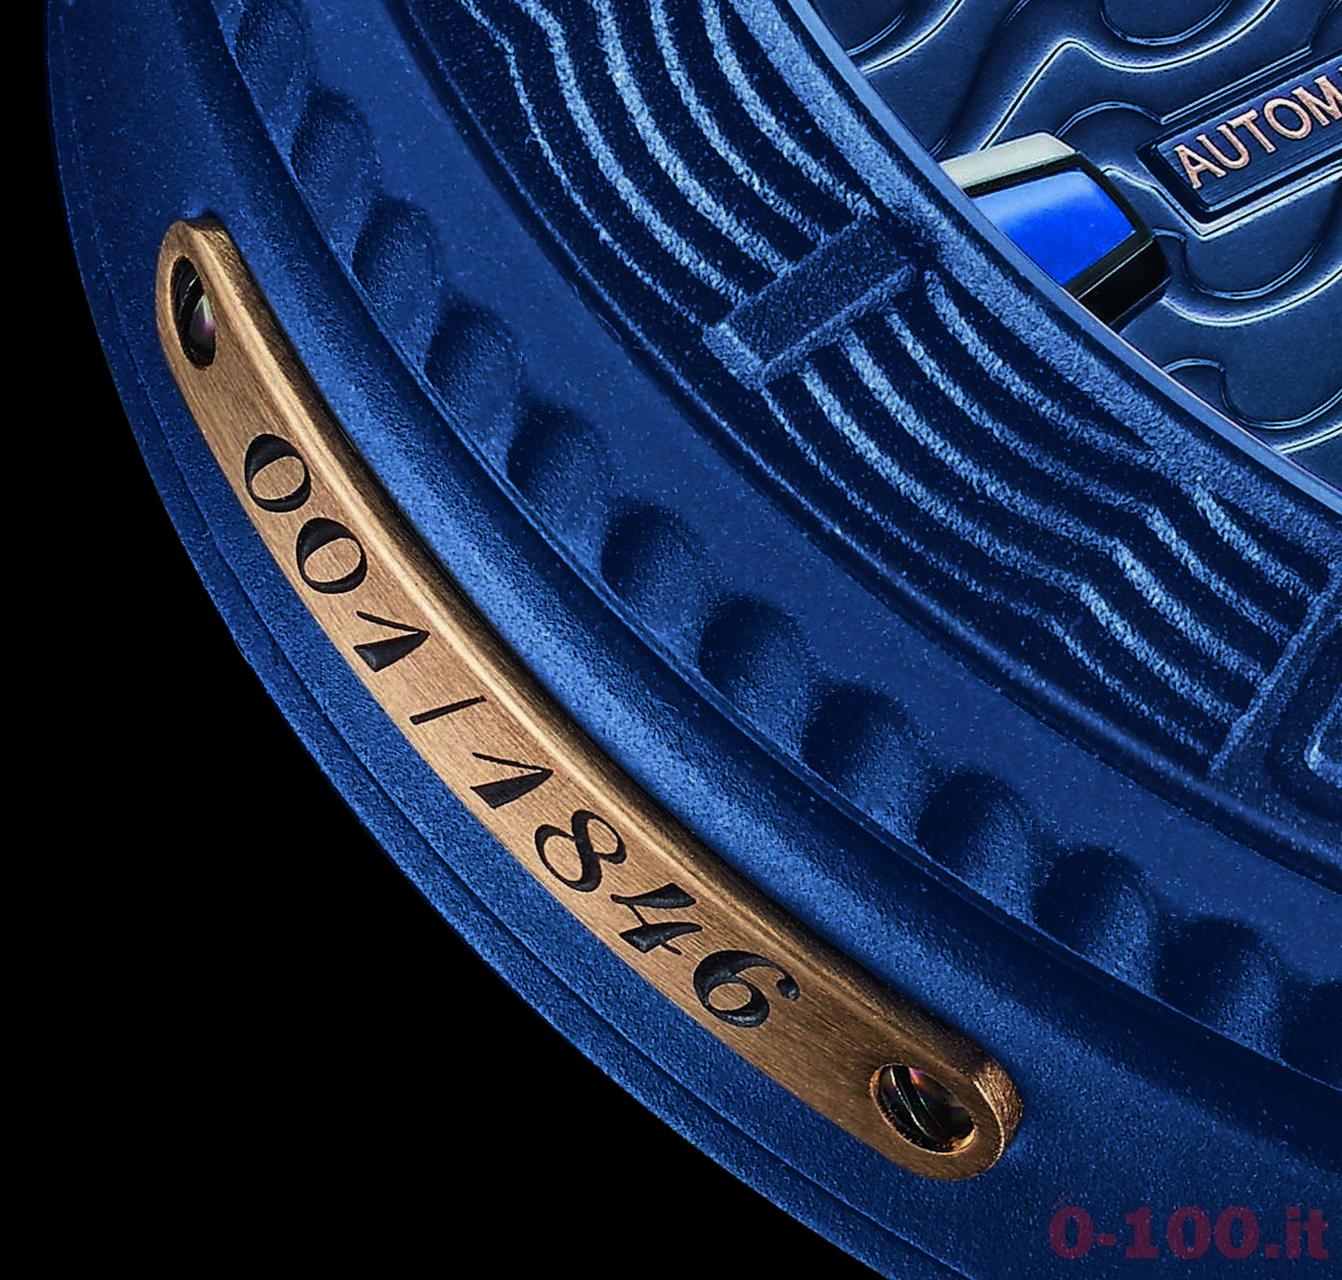 ulysse-nardin-blue-ocean-limited-edition-ref-263-99le-3c-price_0-1004